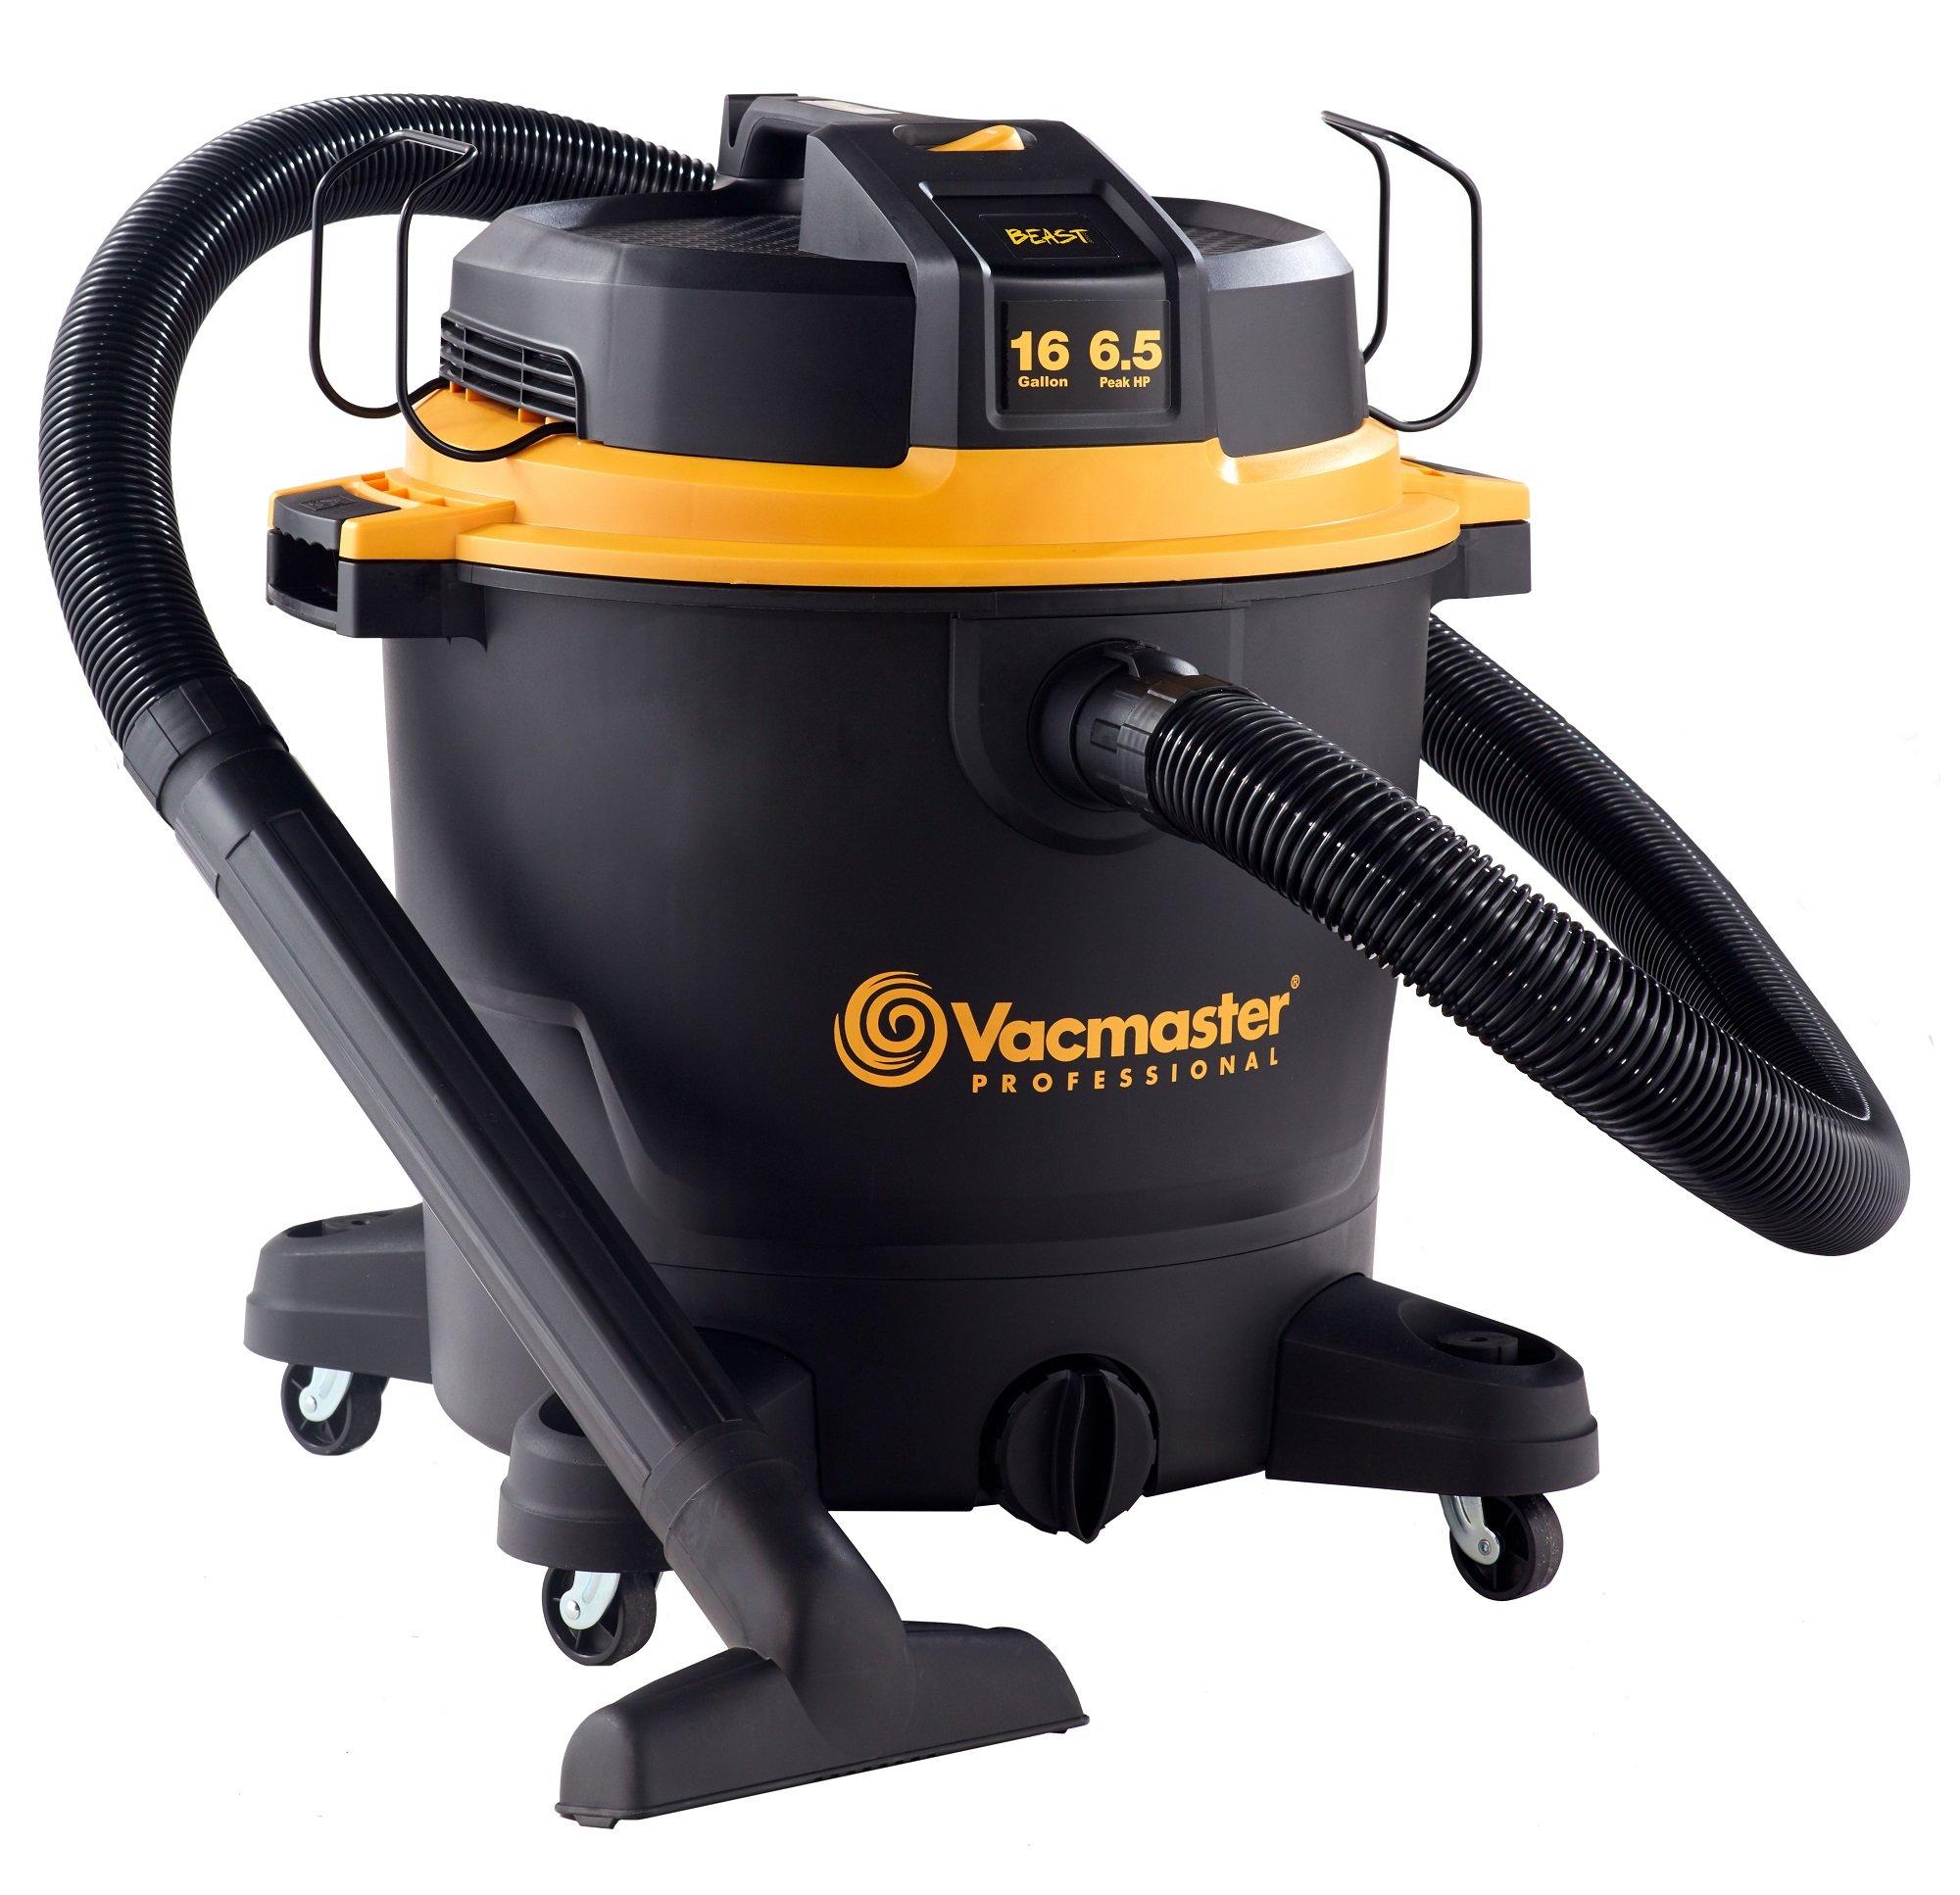 Vacmaster VJH1612PF 0201 Beast Professional Series Wet Dry Vac